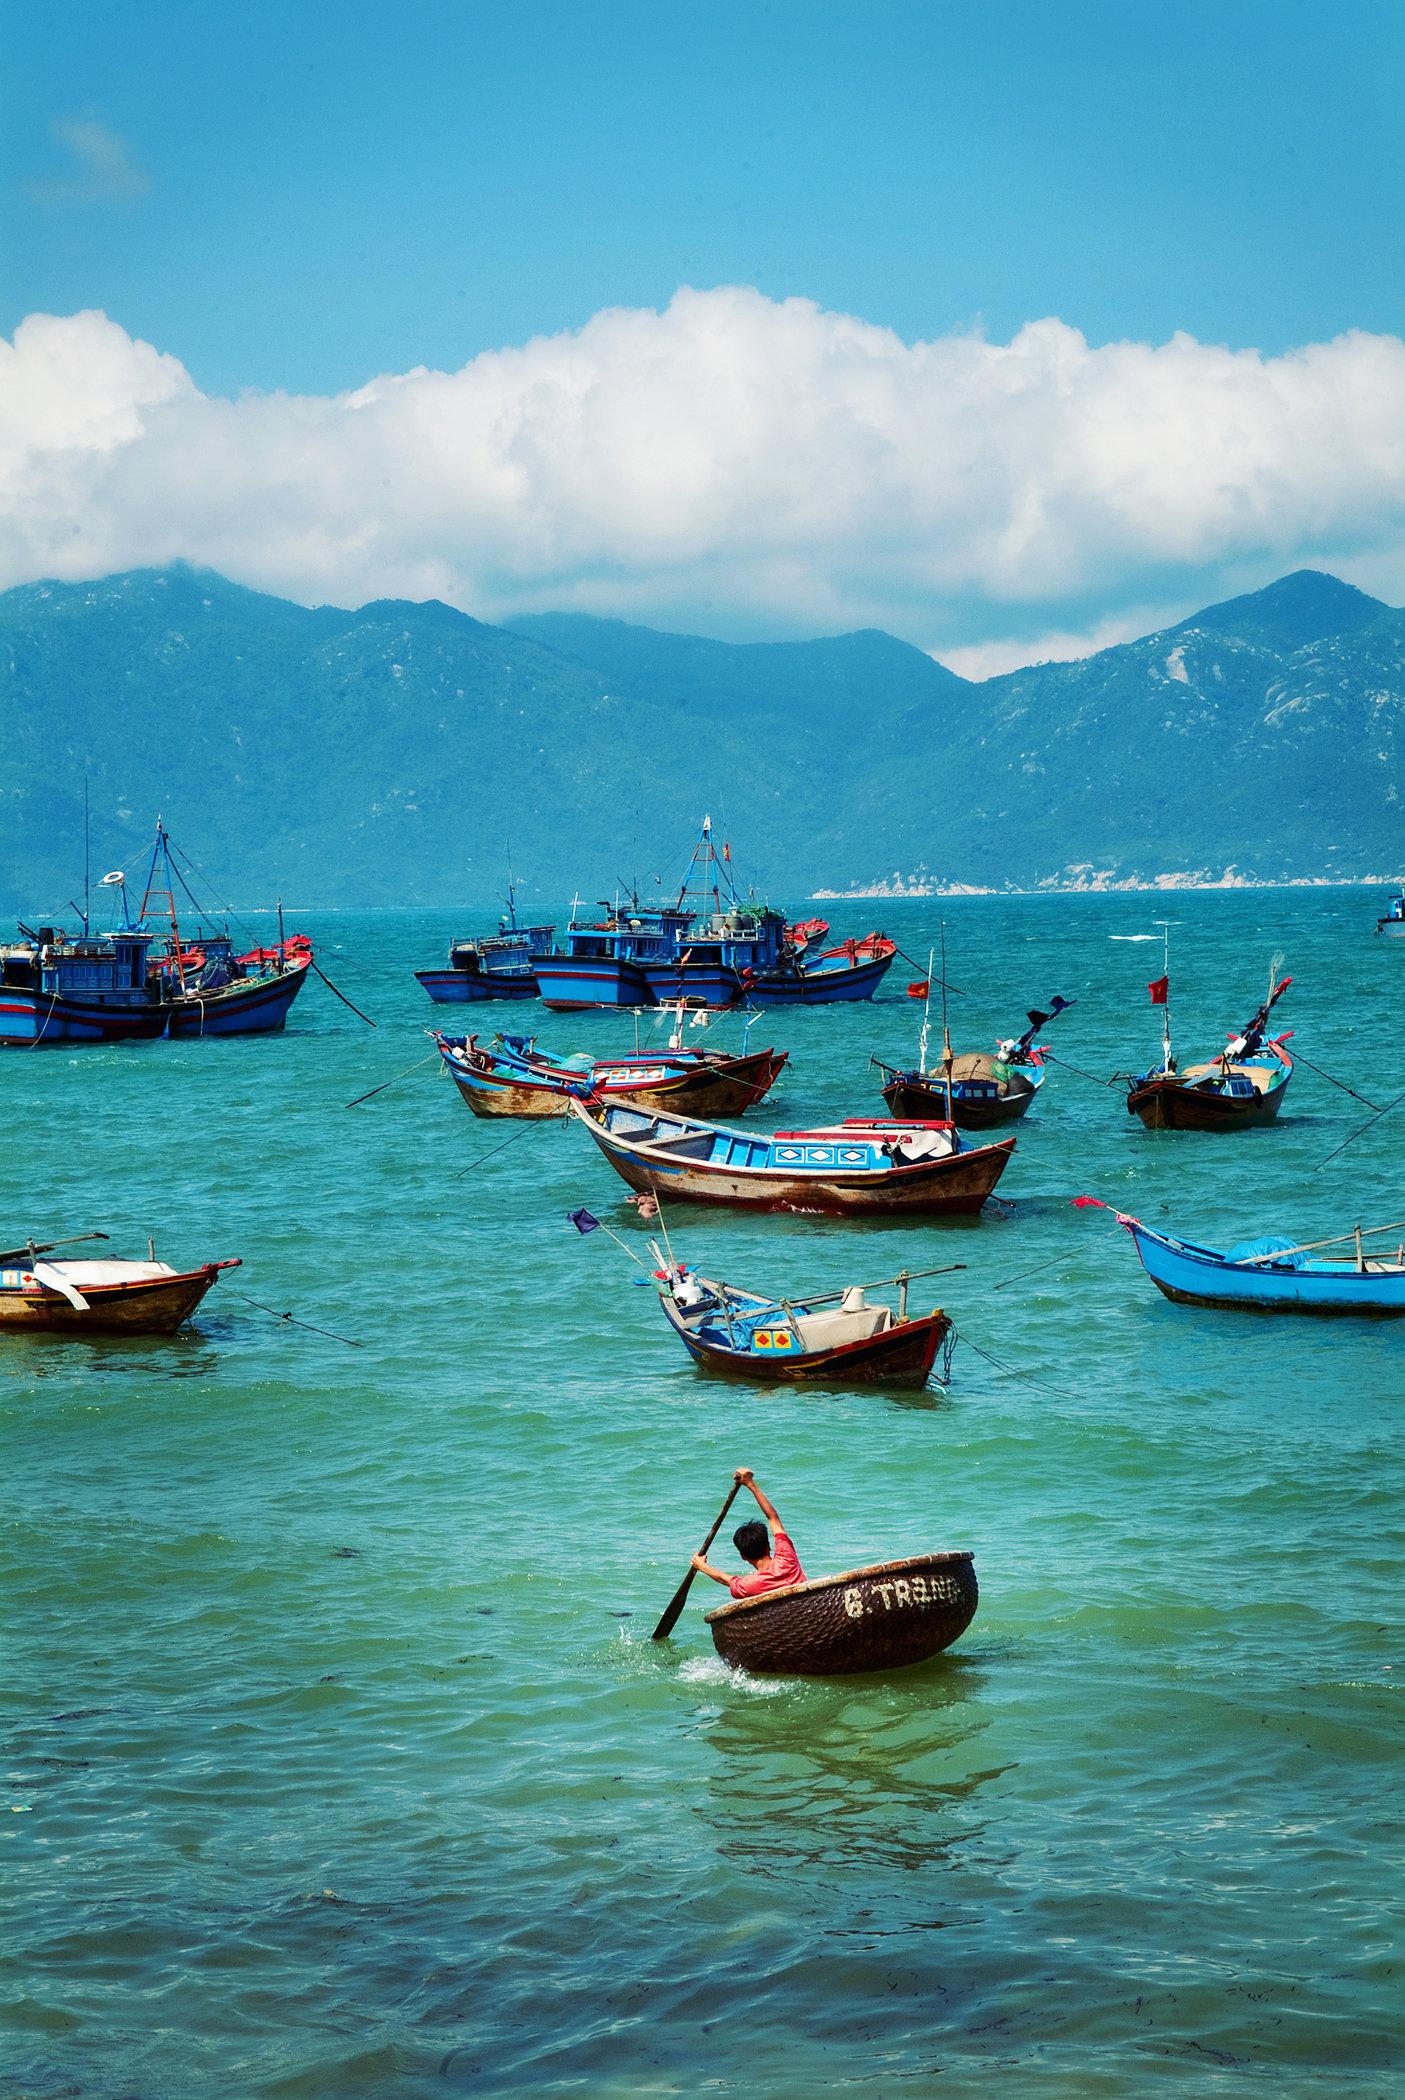 Vietnamese Basket Boats